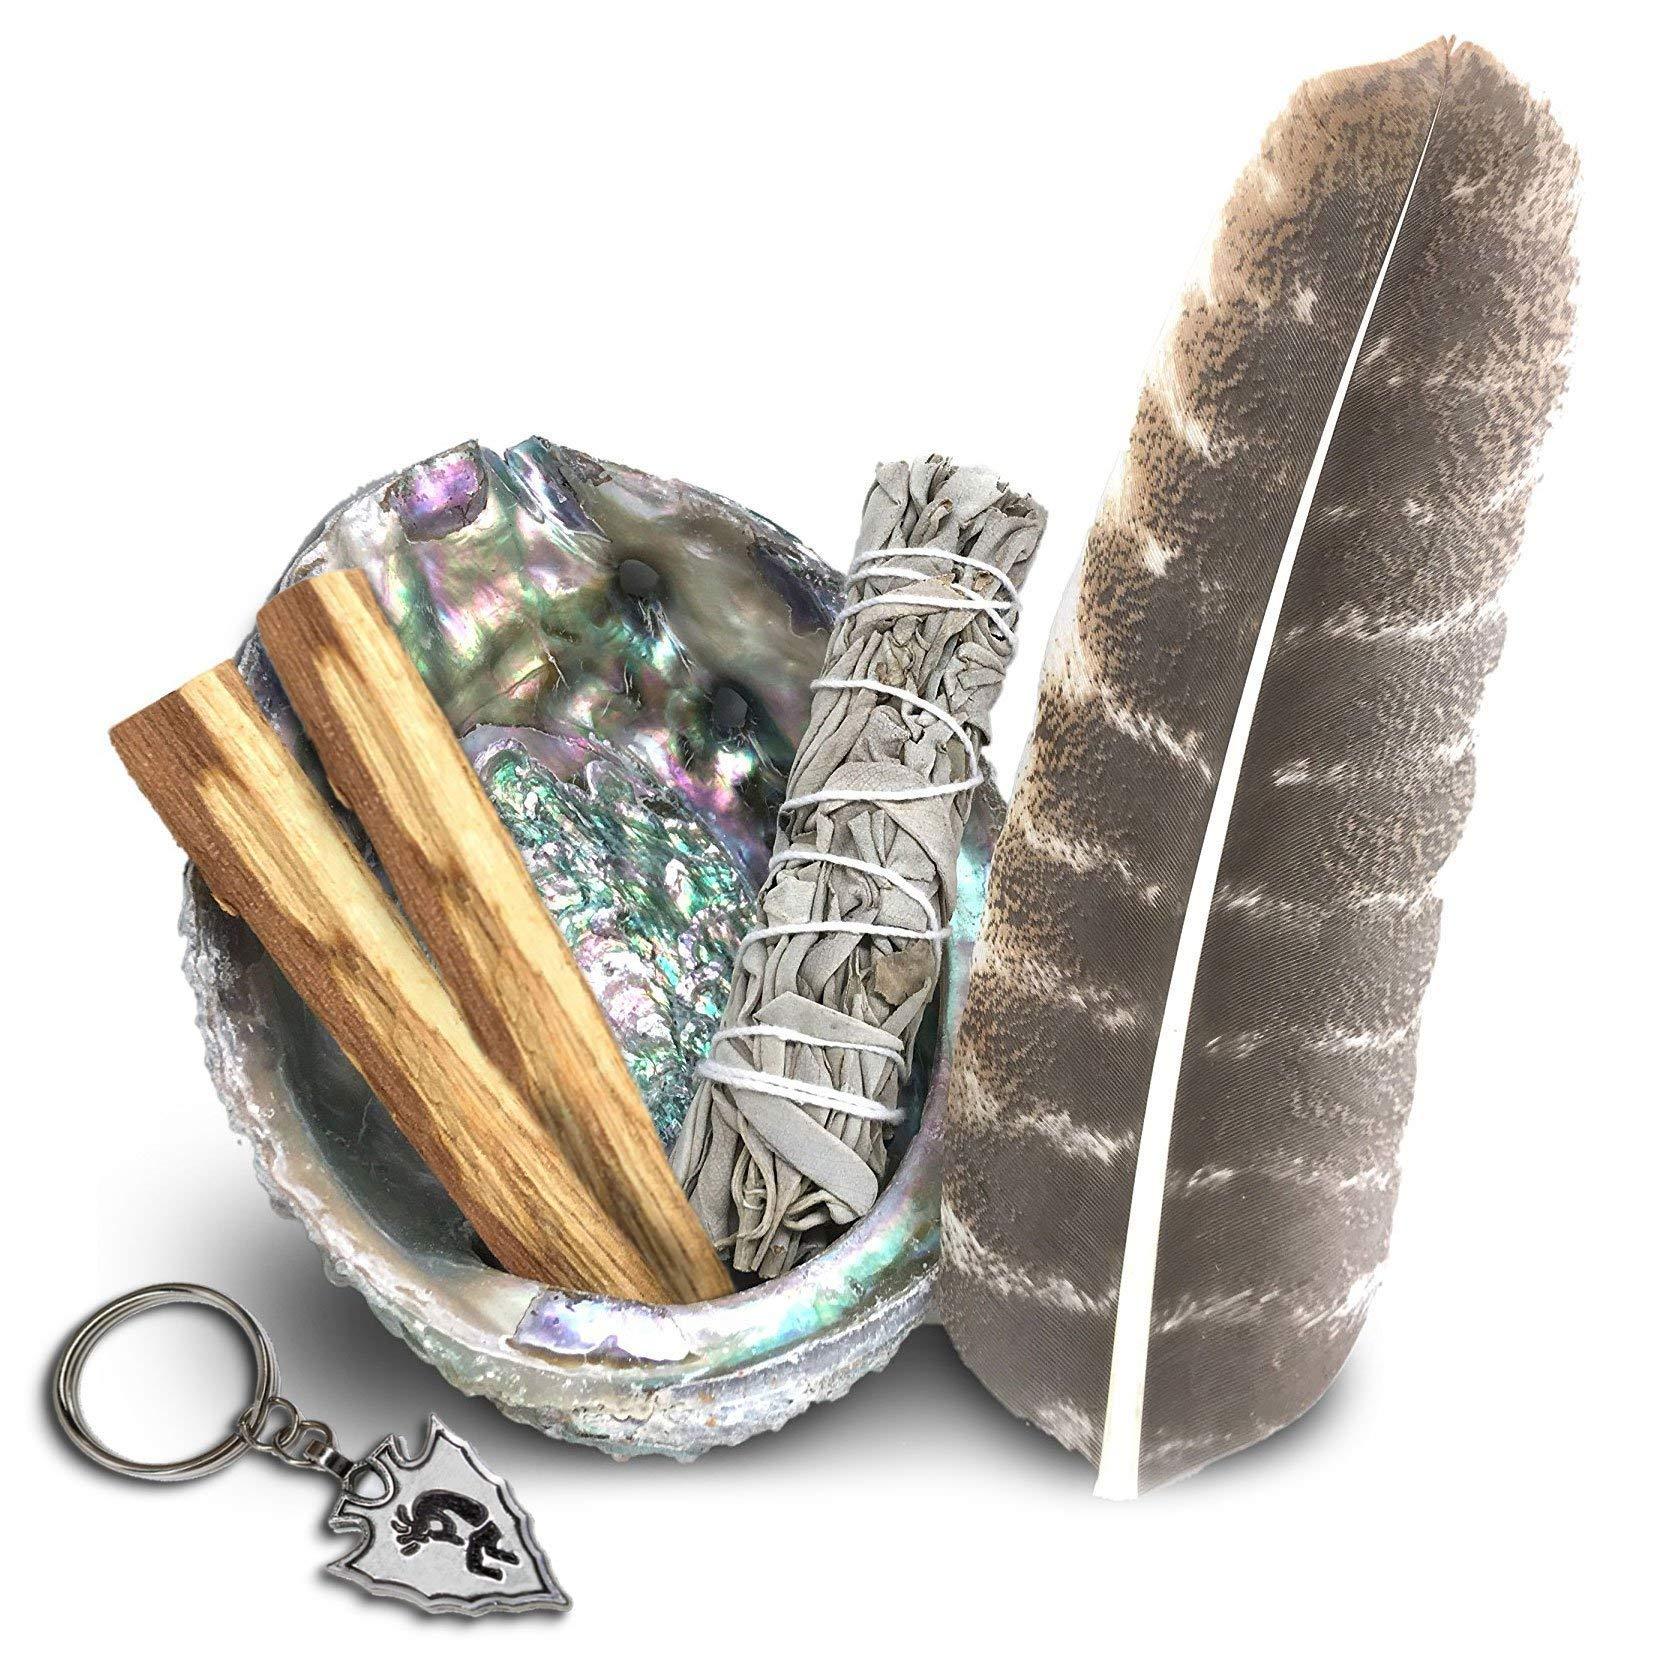 Smudge Kit - Sage, Palo Santo, Abalone Shell, Feather & More! Healing, Purifying, Meditating & Incense